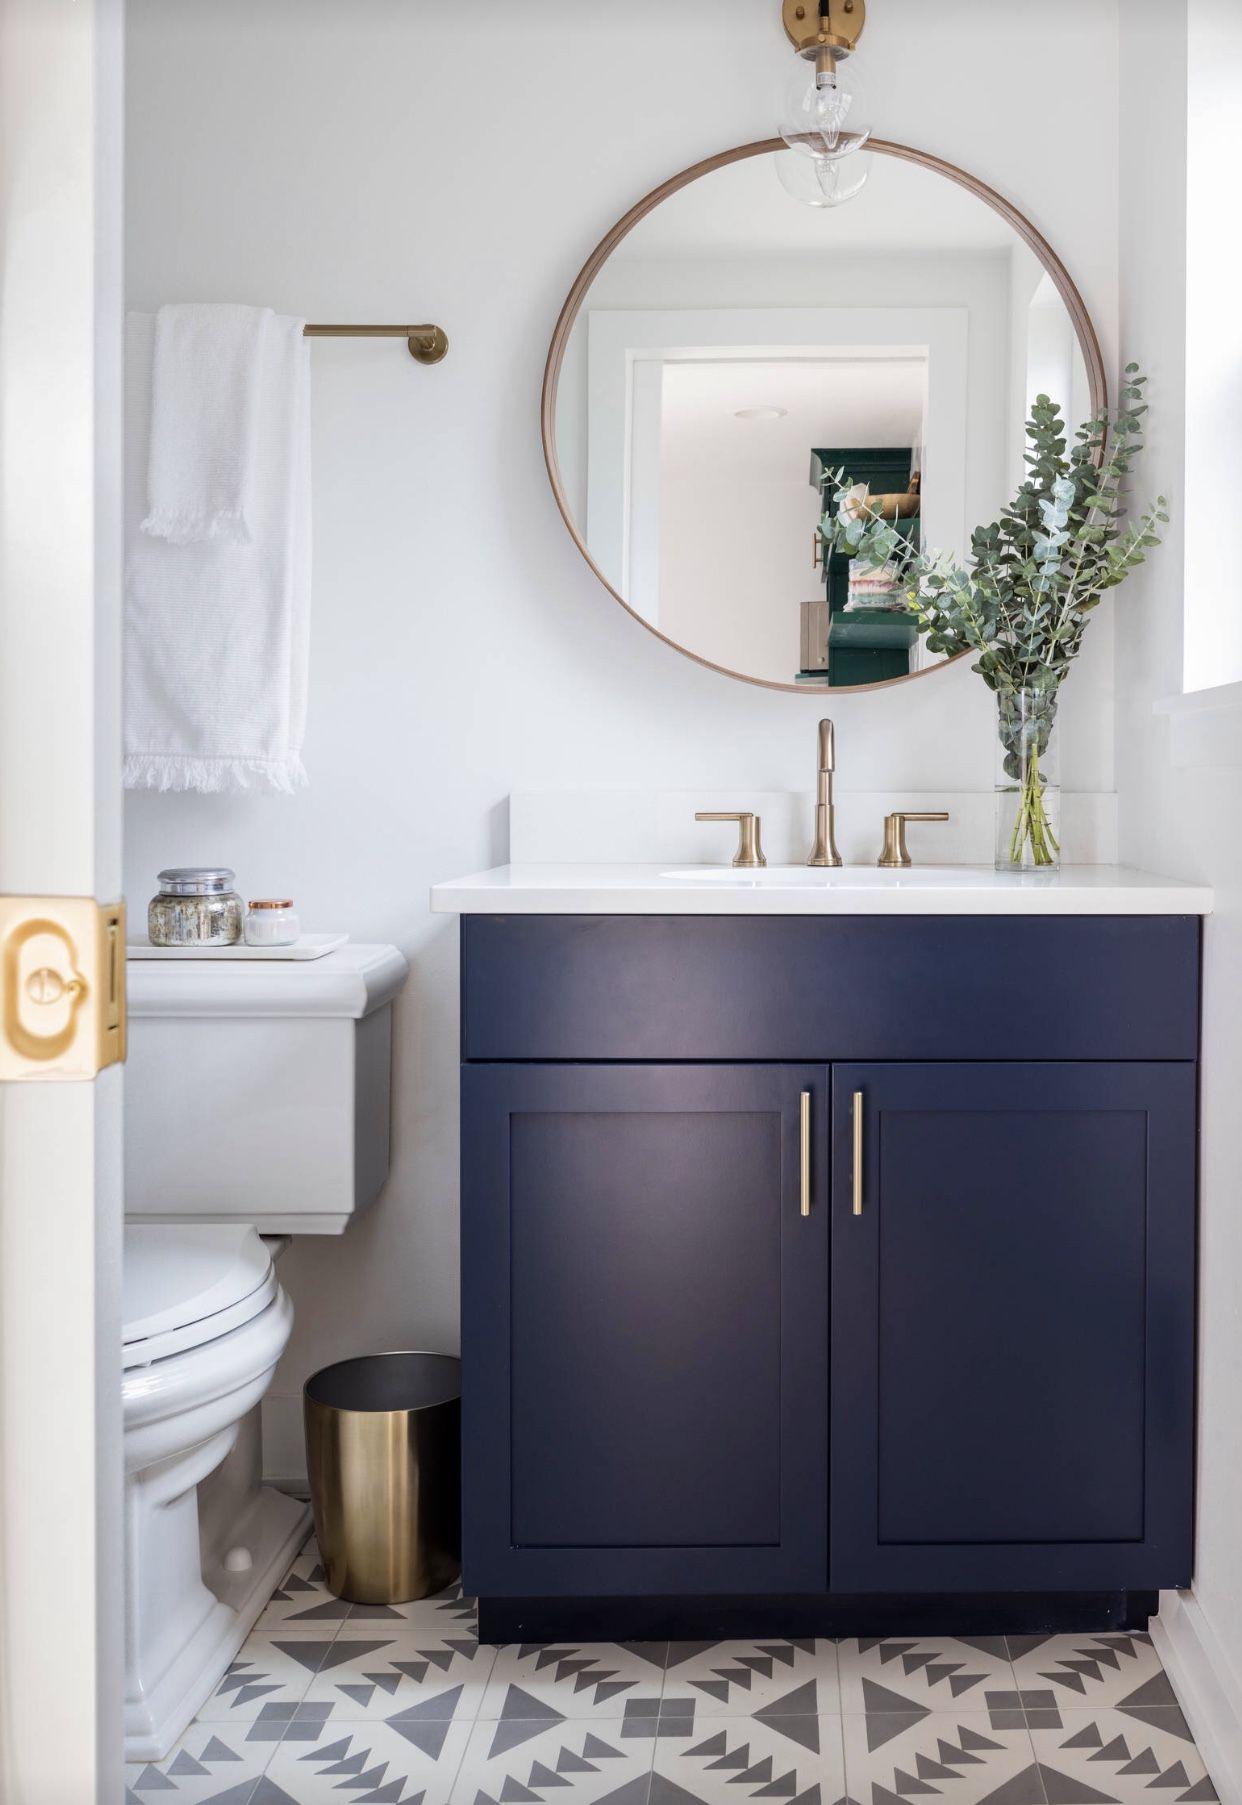 SMALL BATHROOM DESIGN IDEAS – THE LIFESTYLE LOFT